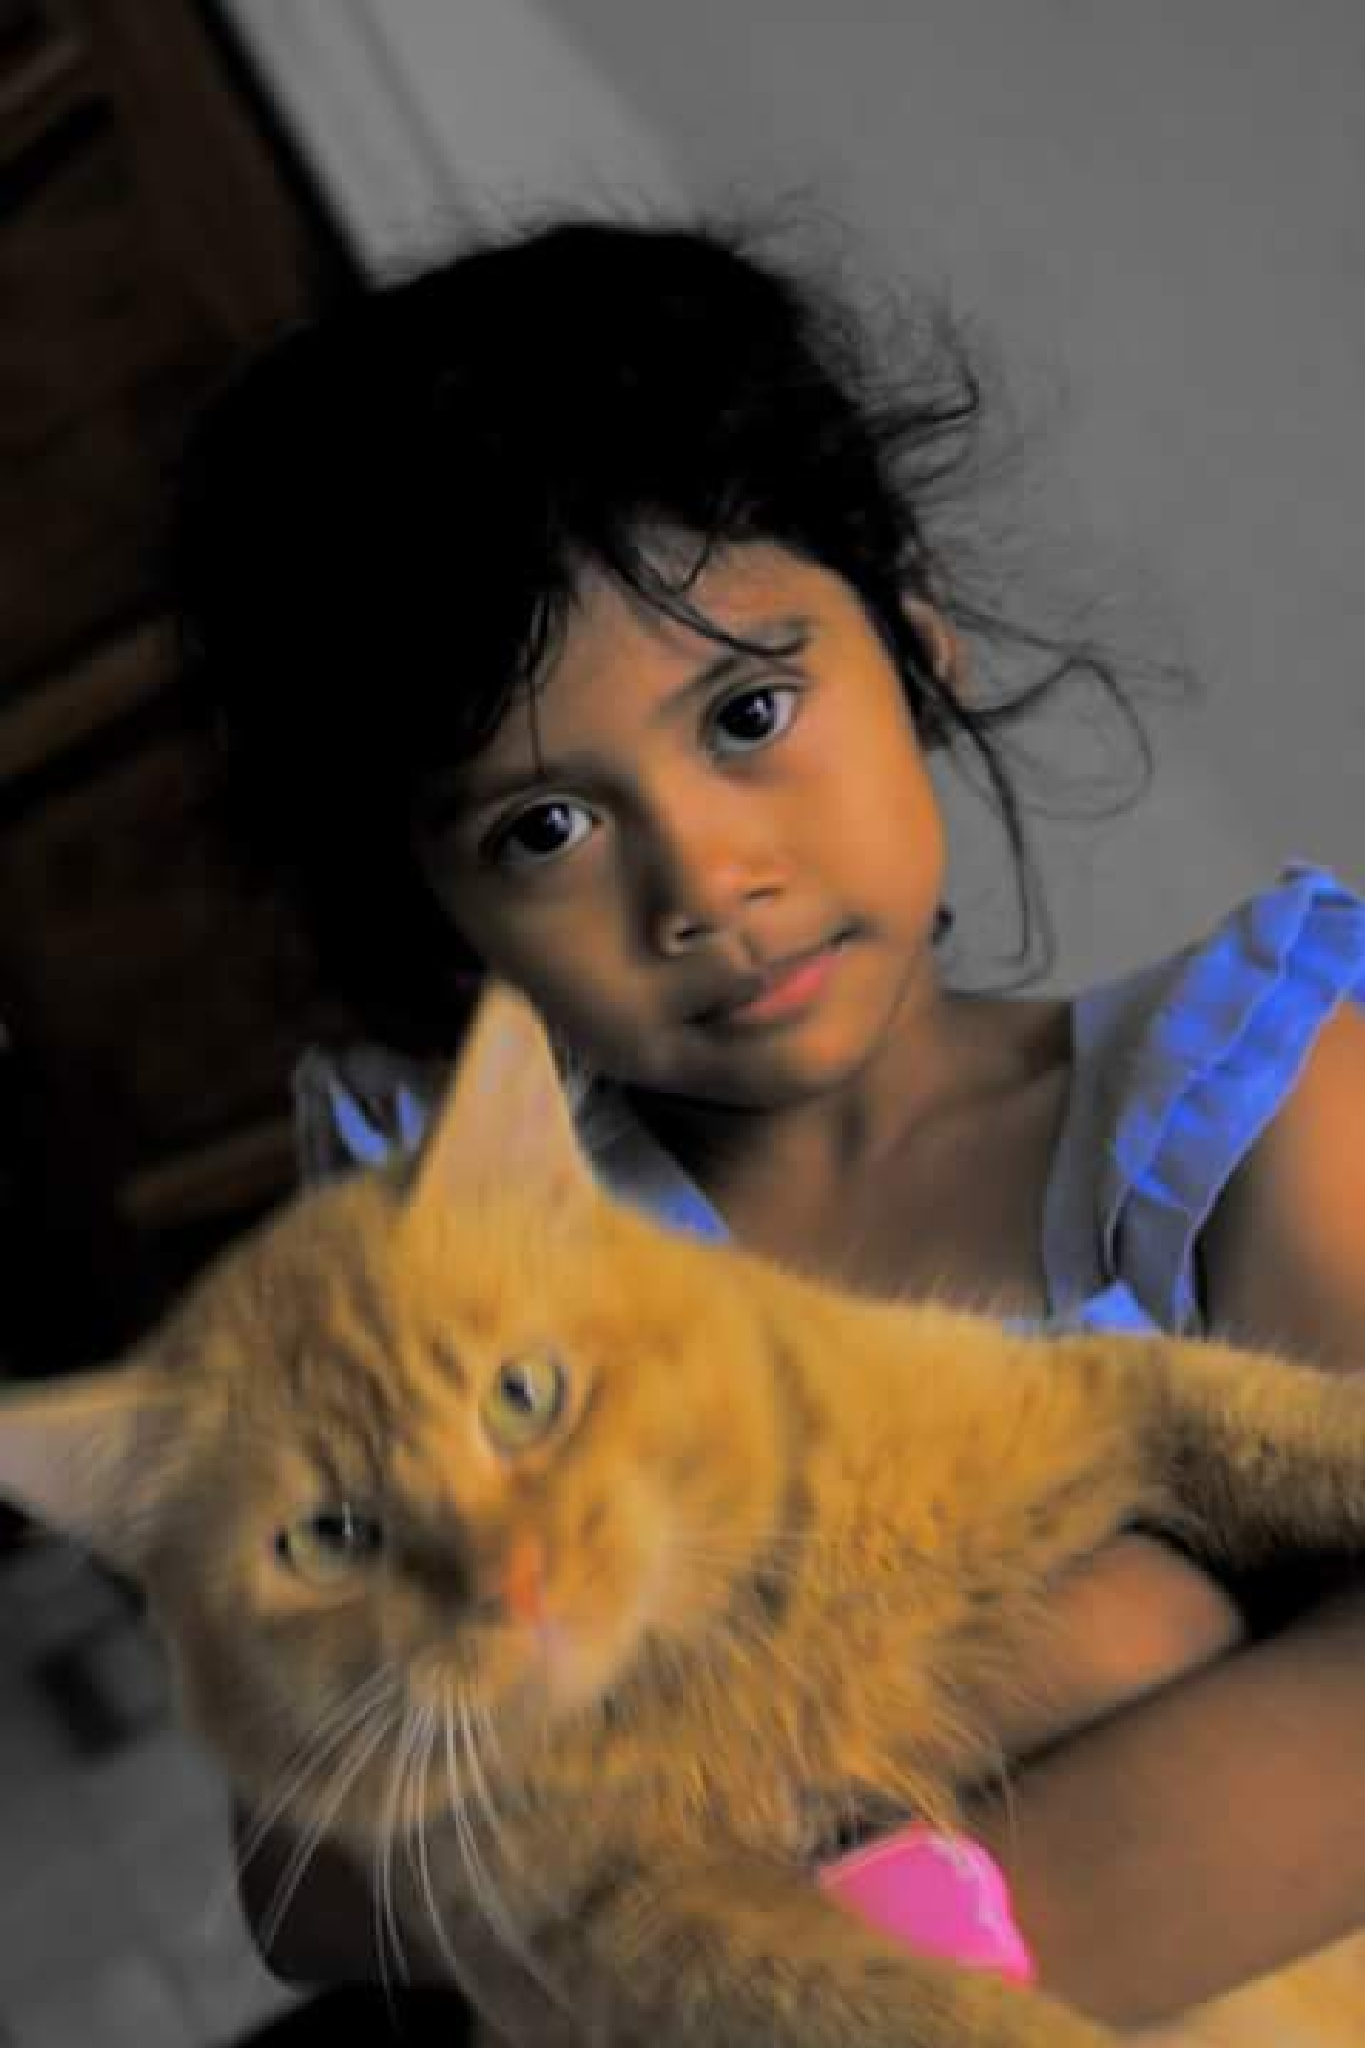 cut and chiko pet cat lost in the earth swallow by Djamhur Abdullah Mimbar